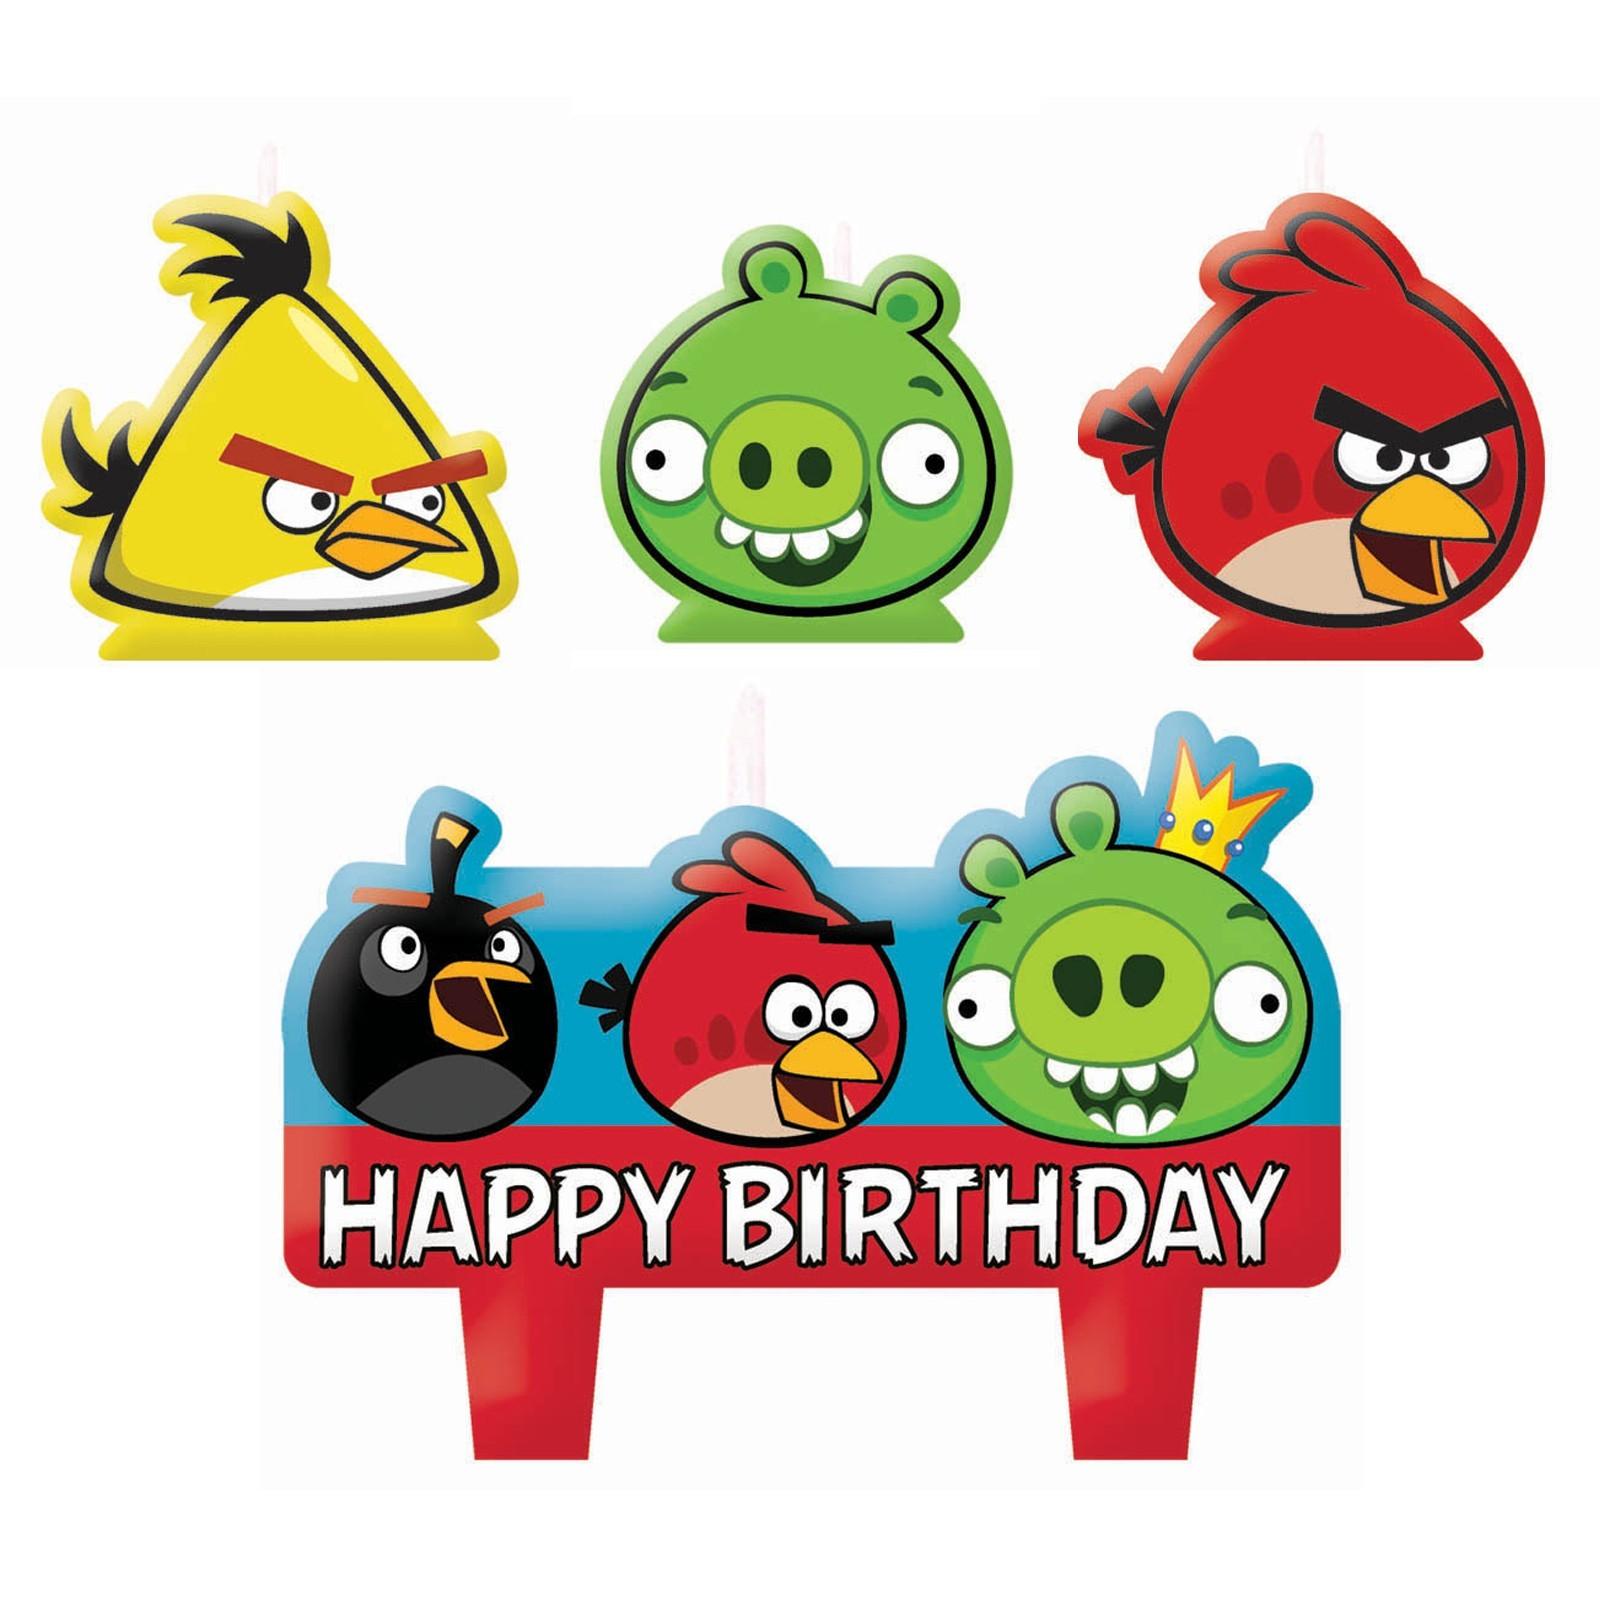 Birthday clipart angry bird Happy Birthday Pics Pinterest Birthday